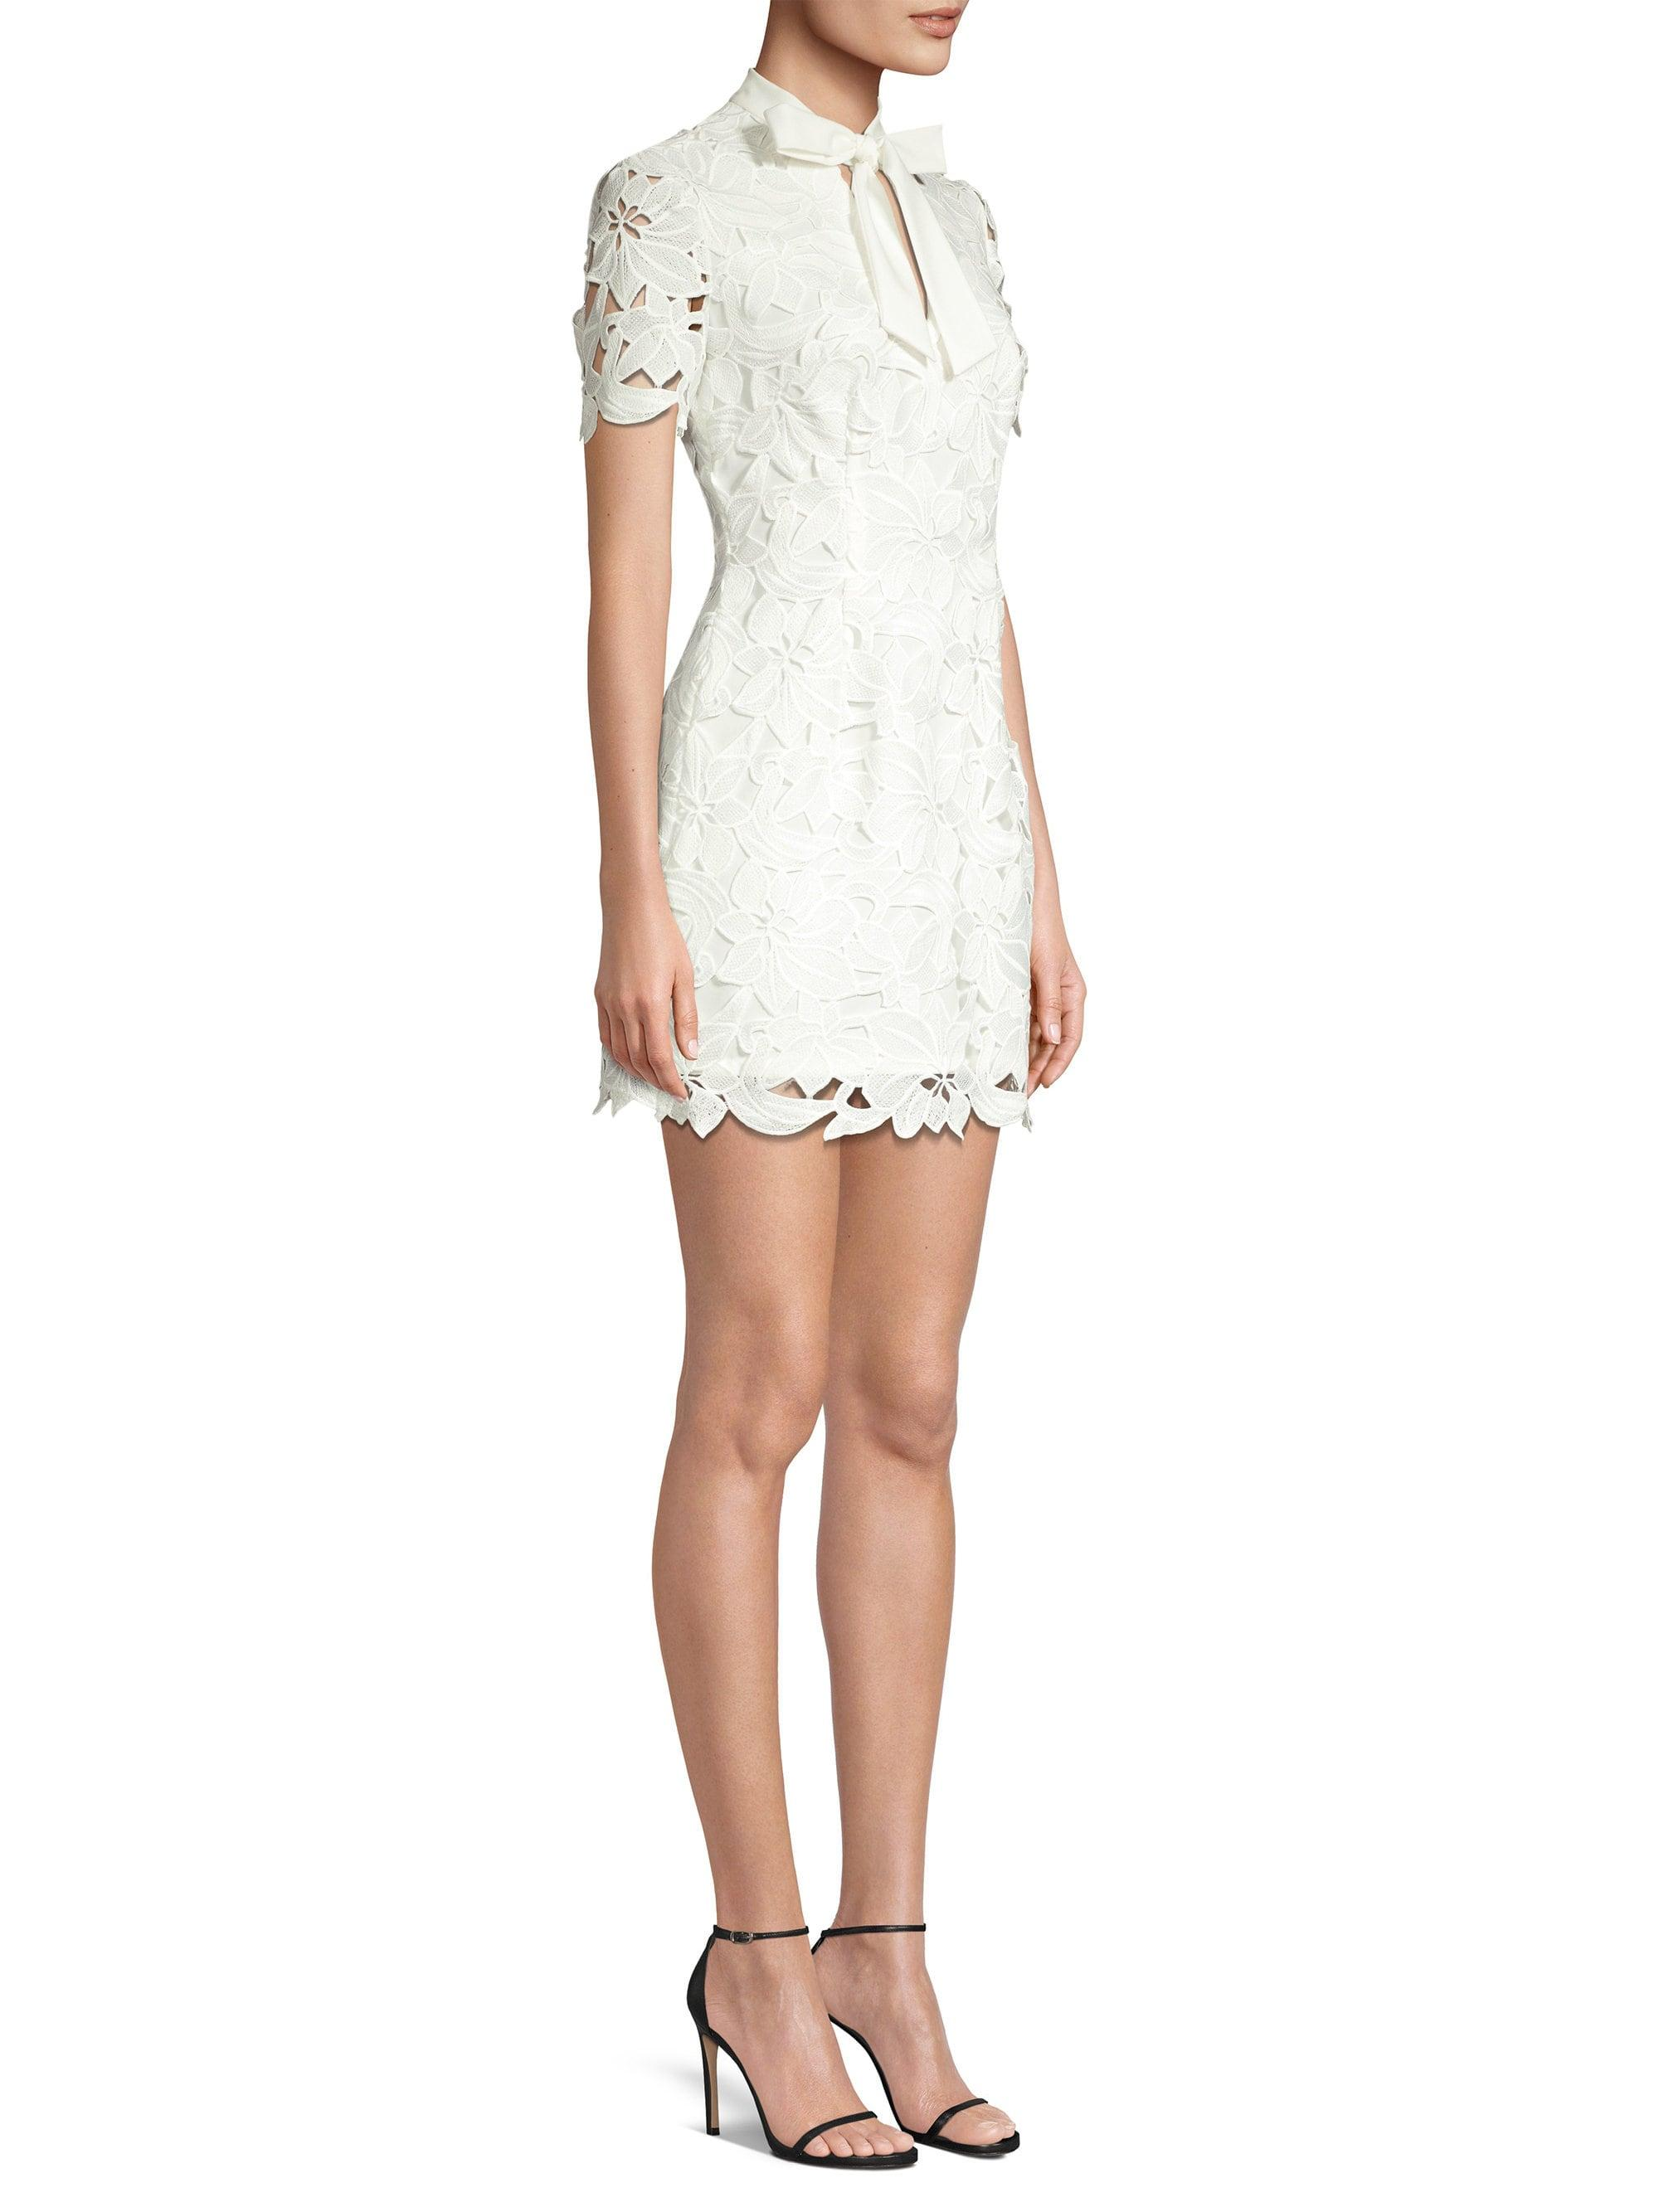 8a8a9b59579 Black Halo Women's Saracen Bow Mini Dress - Moon Mist - Size 2 in White -  Lyst